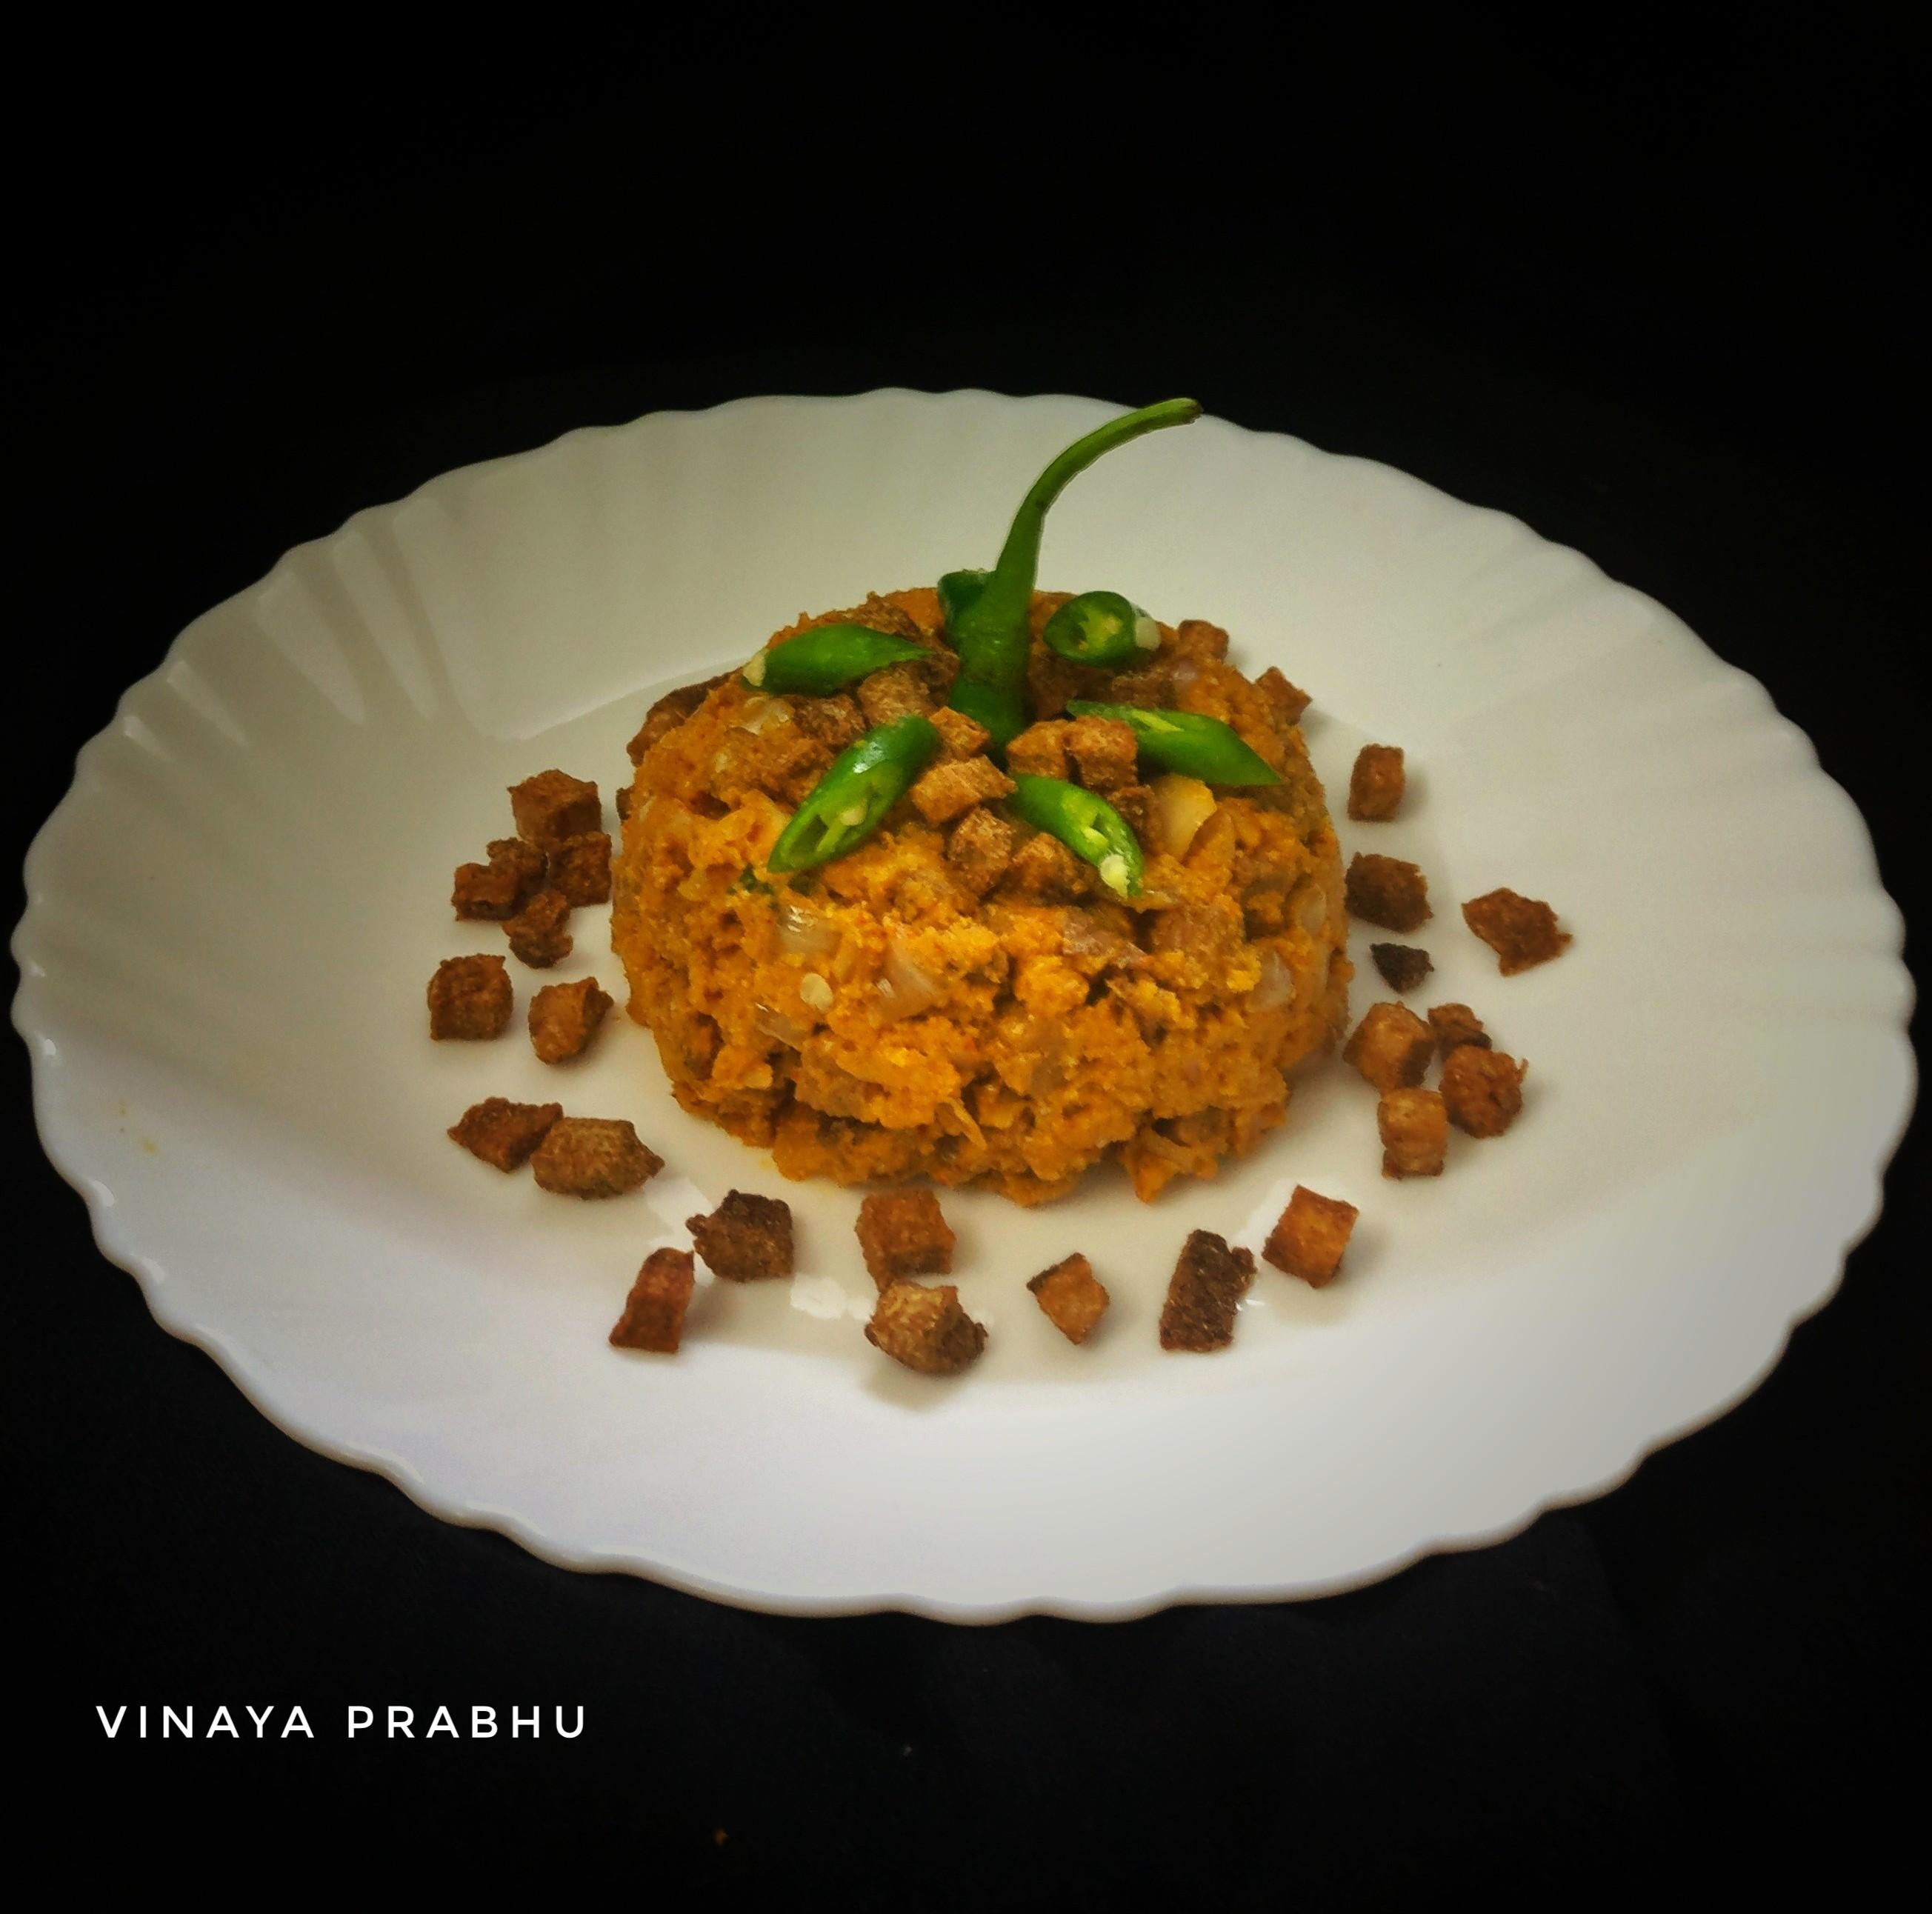 Vinaya's Culinary Delights